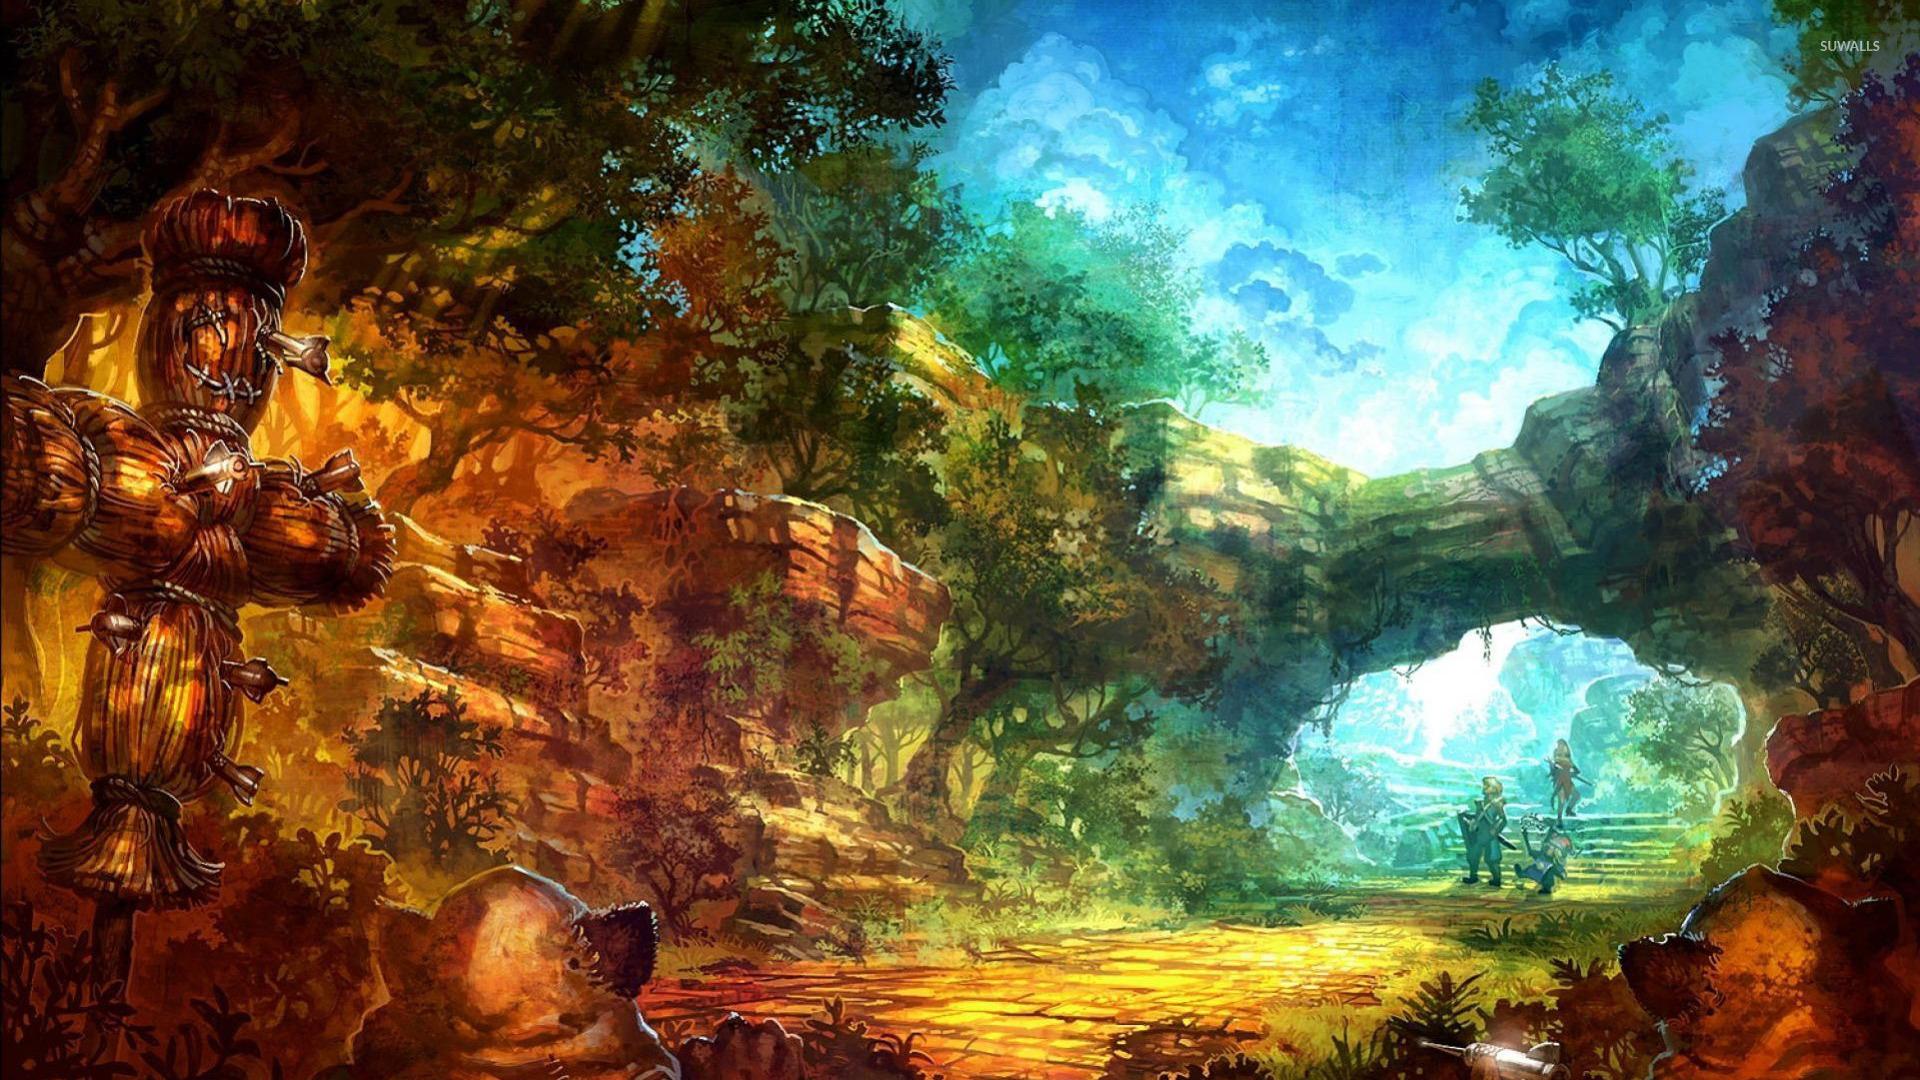 Game Wallpaper: Secret Of Mana Wallpaper